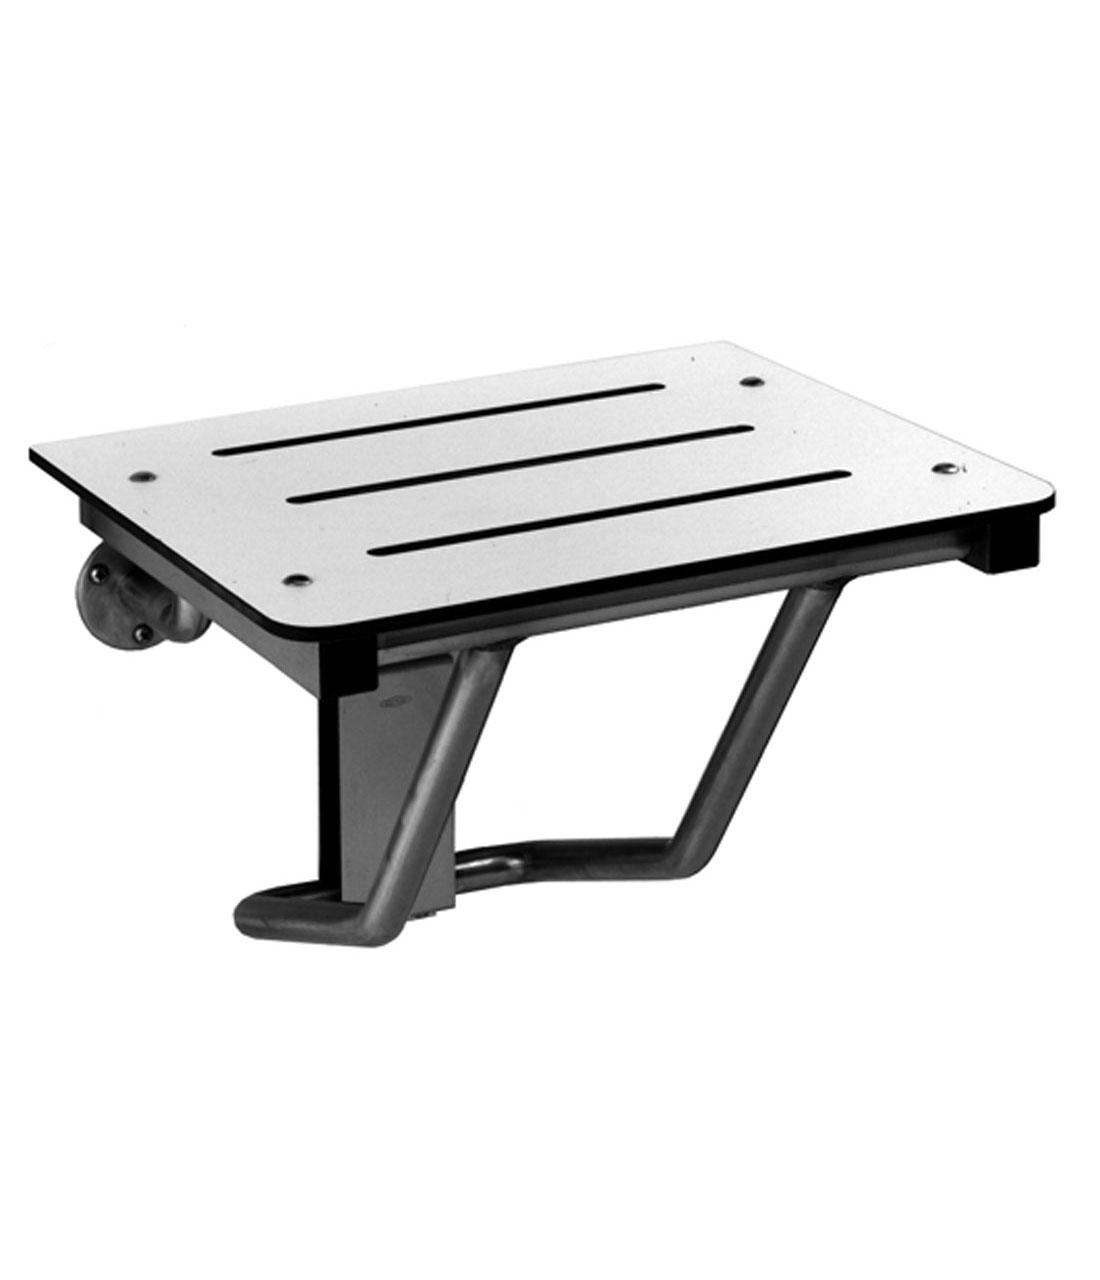 Gamco 5191 Folding Solid Phenolic Shower Seat